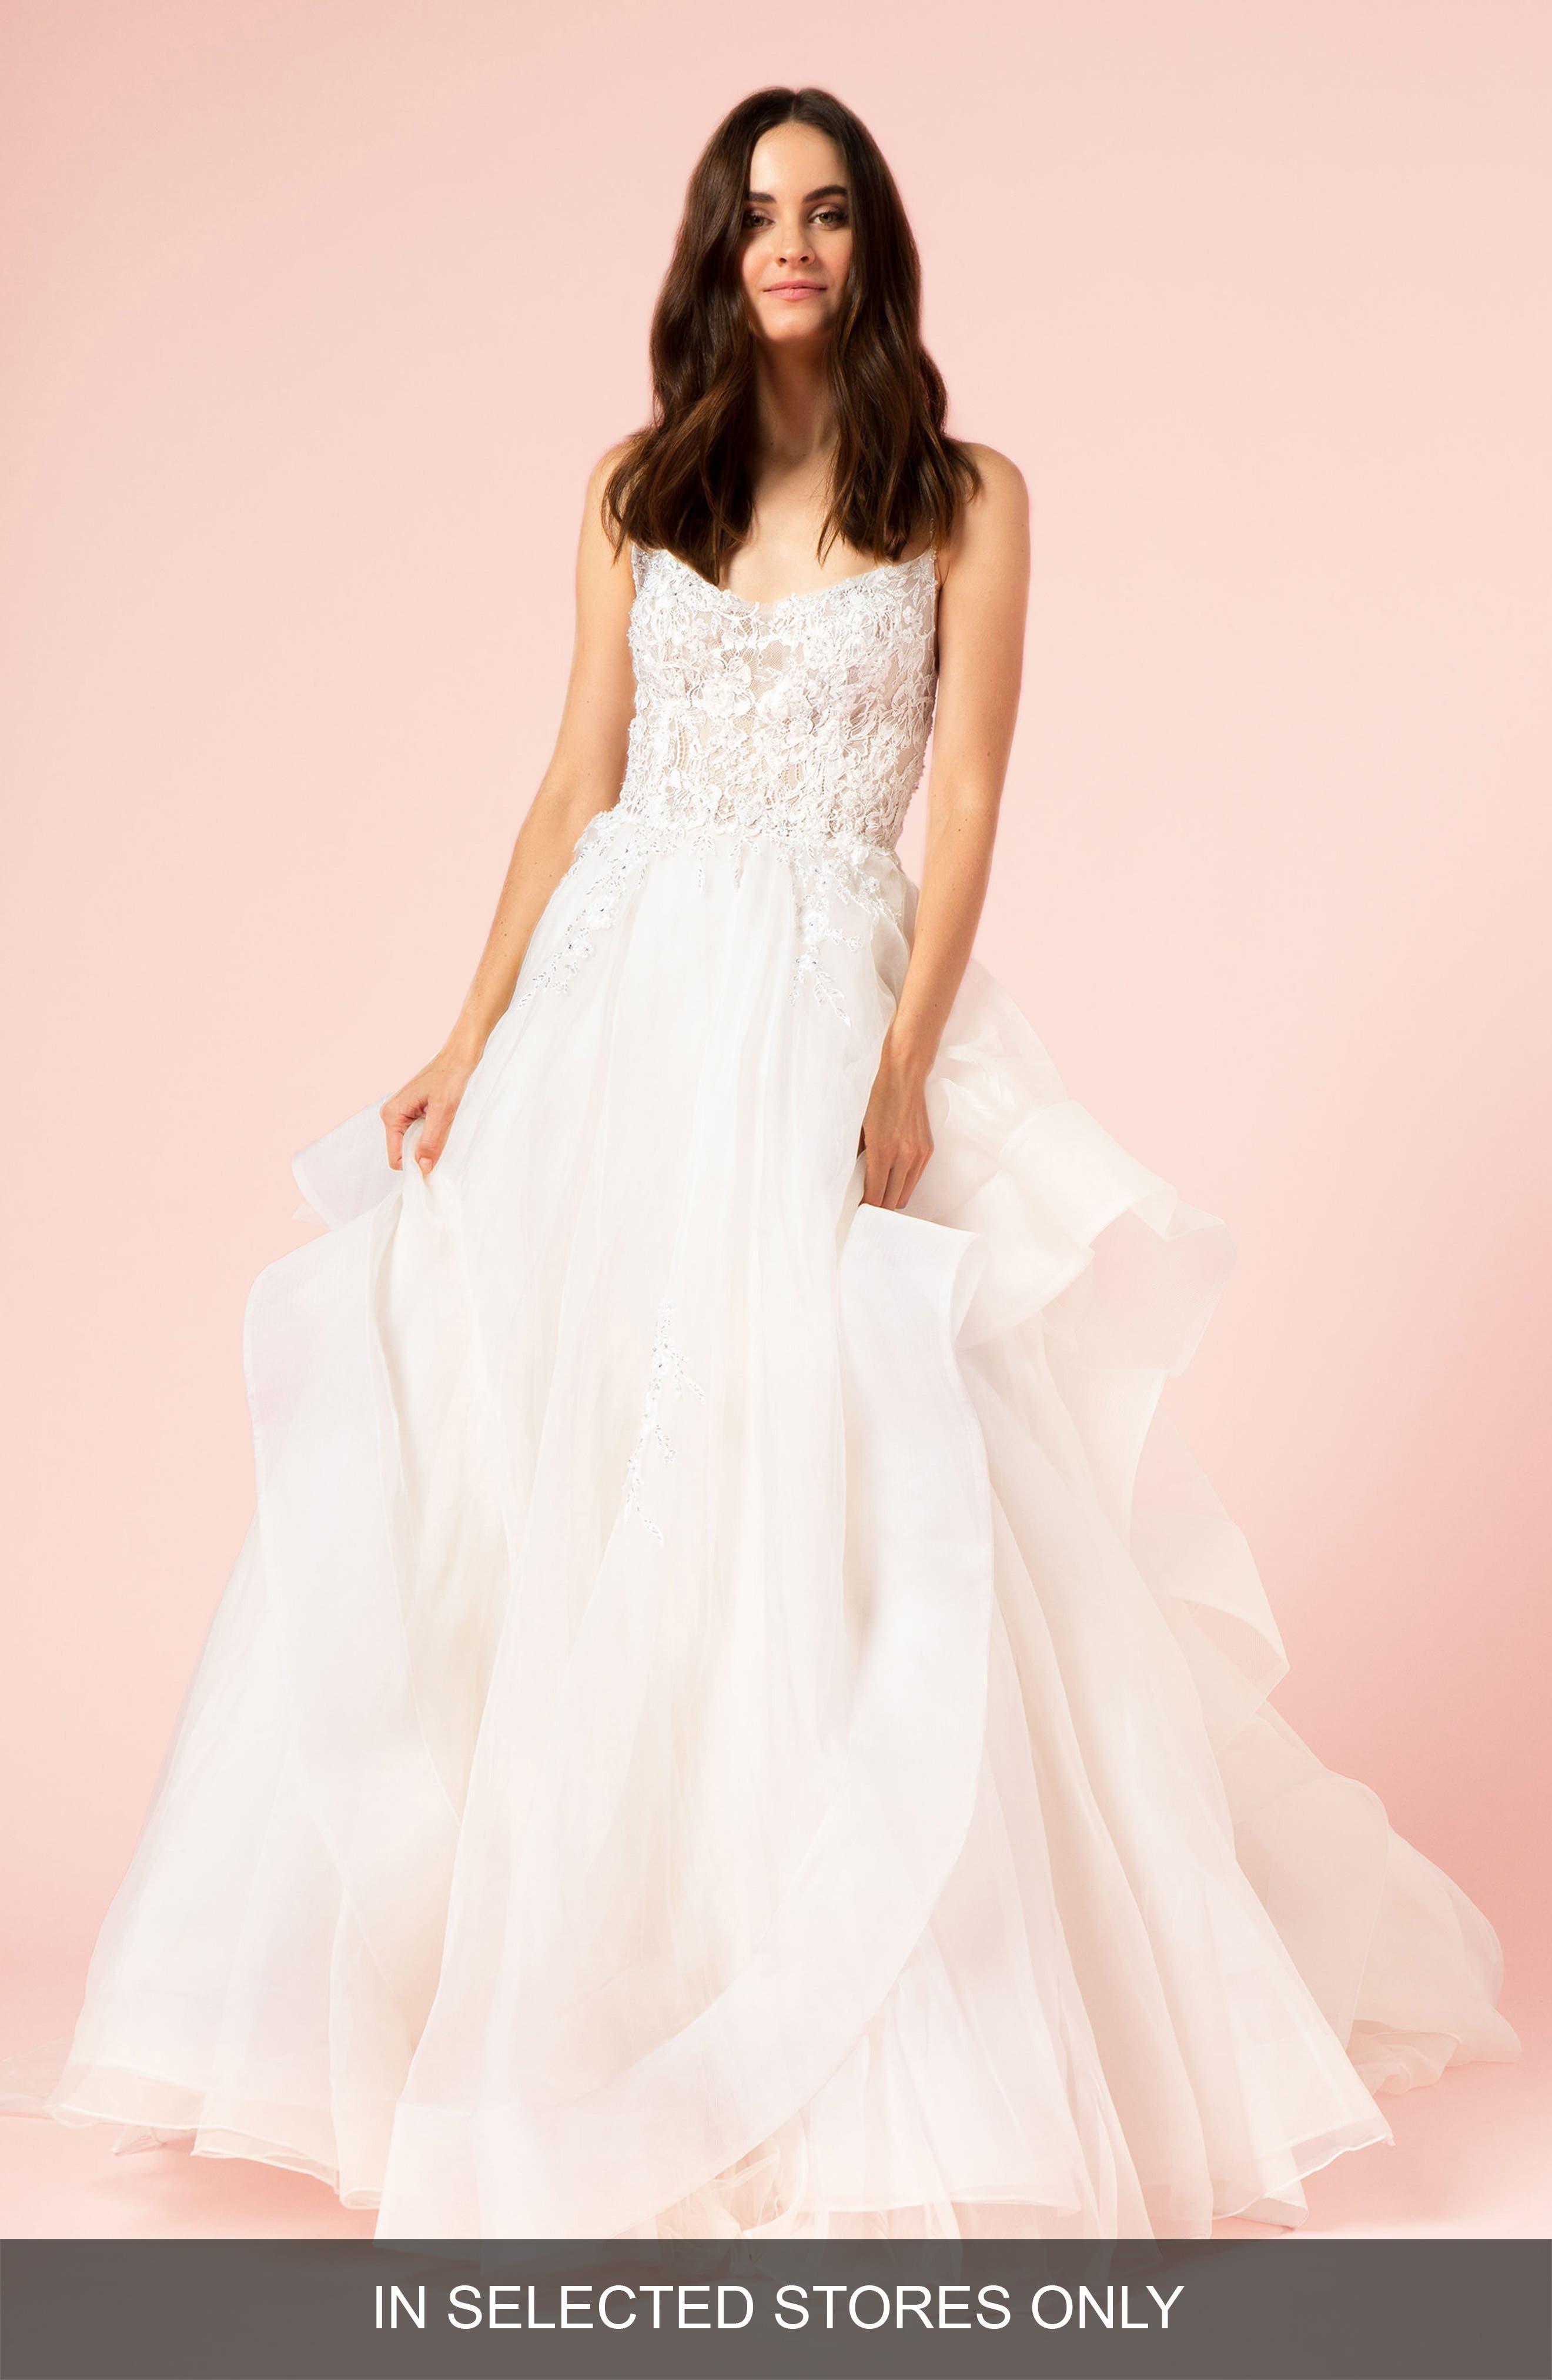 Embellished Lace & Organza Ballgown,                         Main,                         color, SILK WHITE/ SILK WHITE